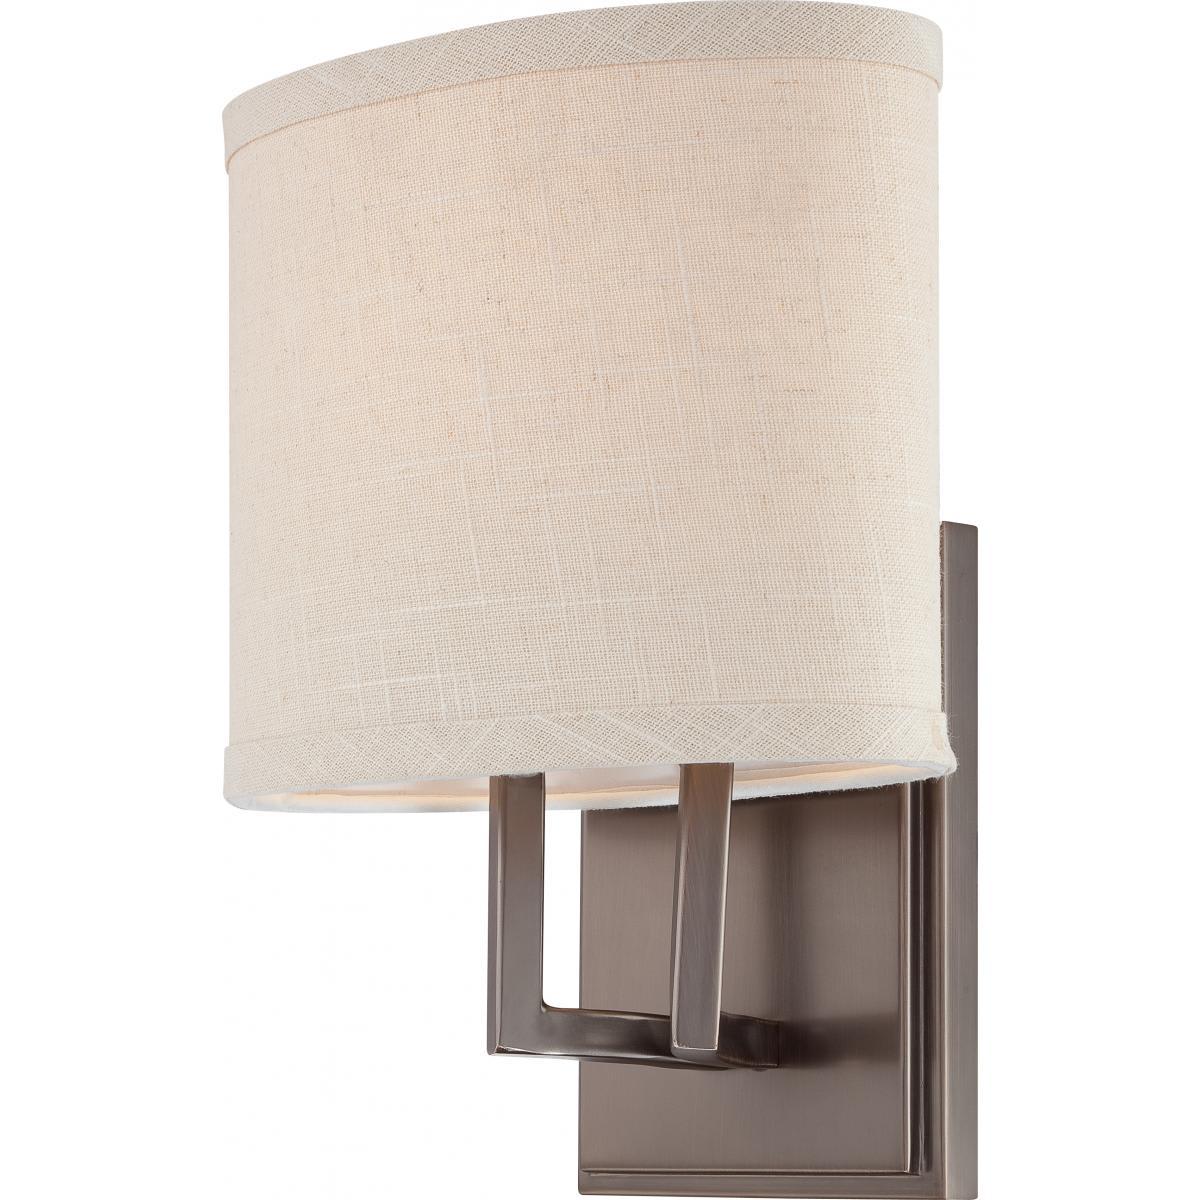 Nuvo Lighting 60 4851 Hazel Bronze Gemini Single Light 8 Wide Bathroom Sconce With Woven Fabric Shade Lightingdirect Com